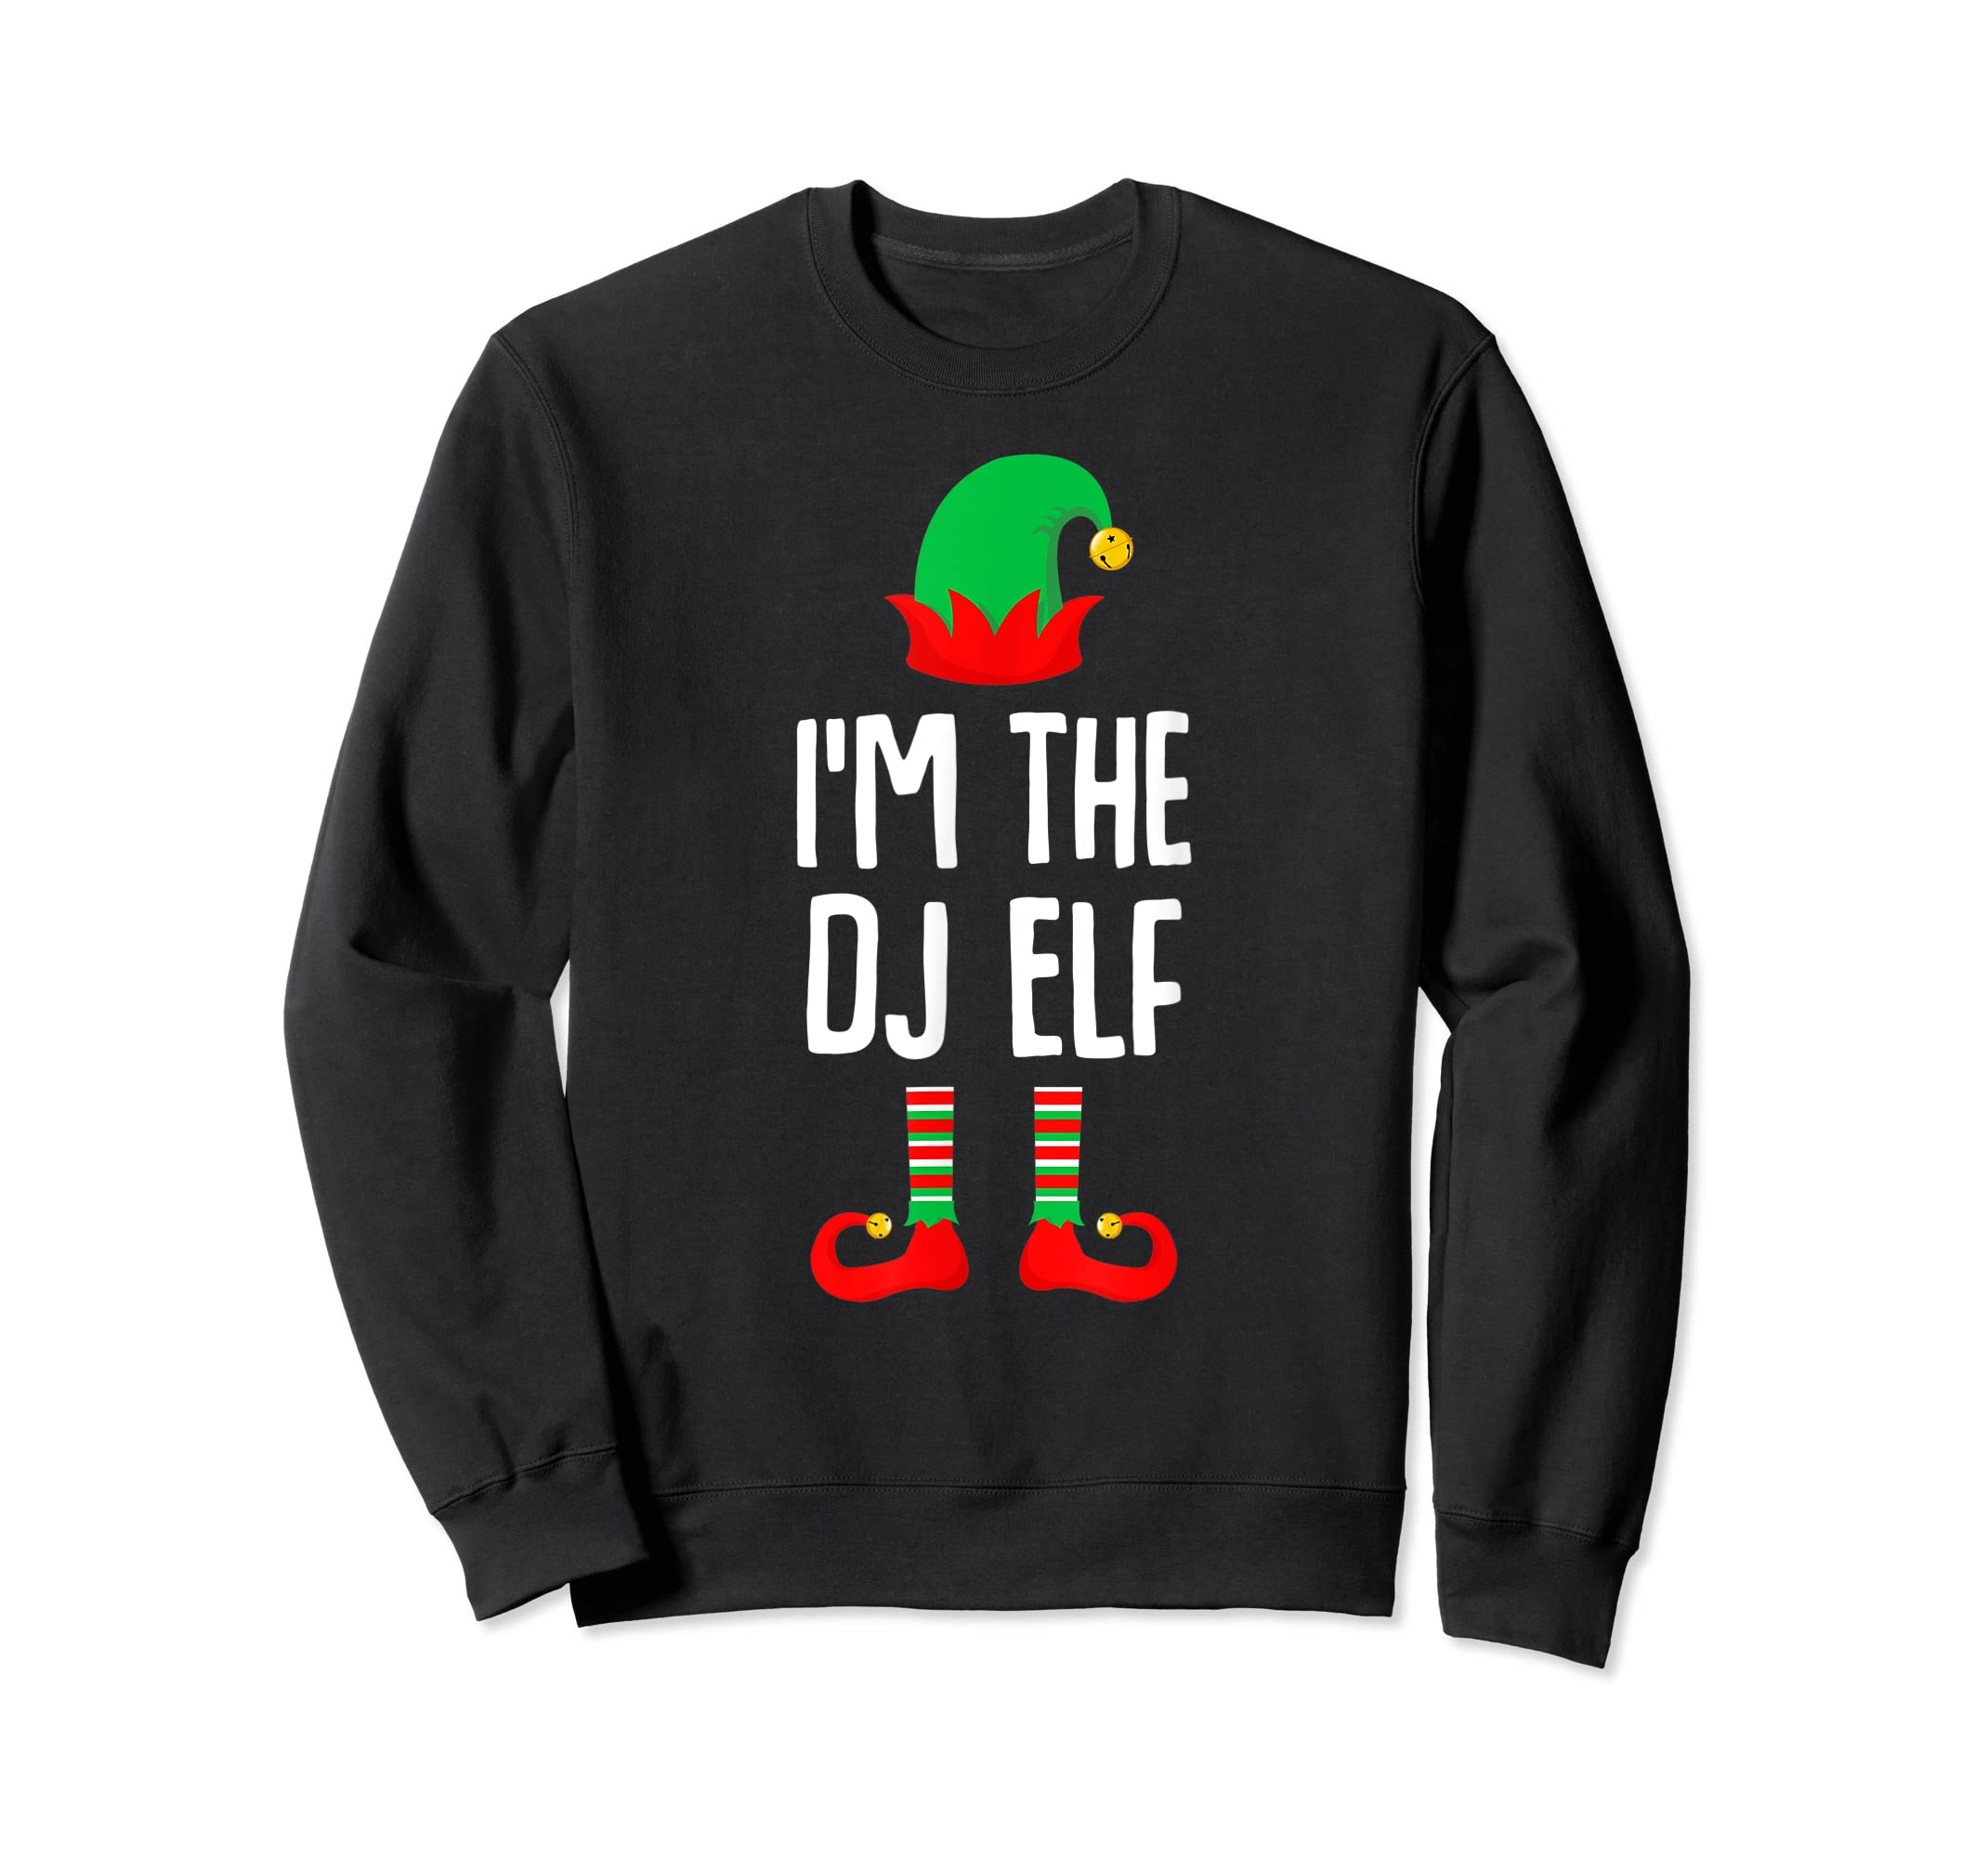 I'm The Dj Elf Matching Family Group Christmas T-Shirt-Sweatshirt-Black